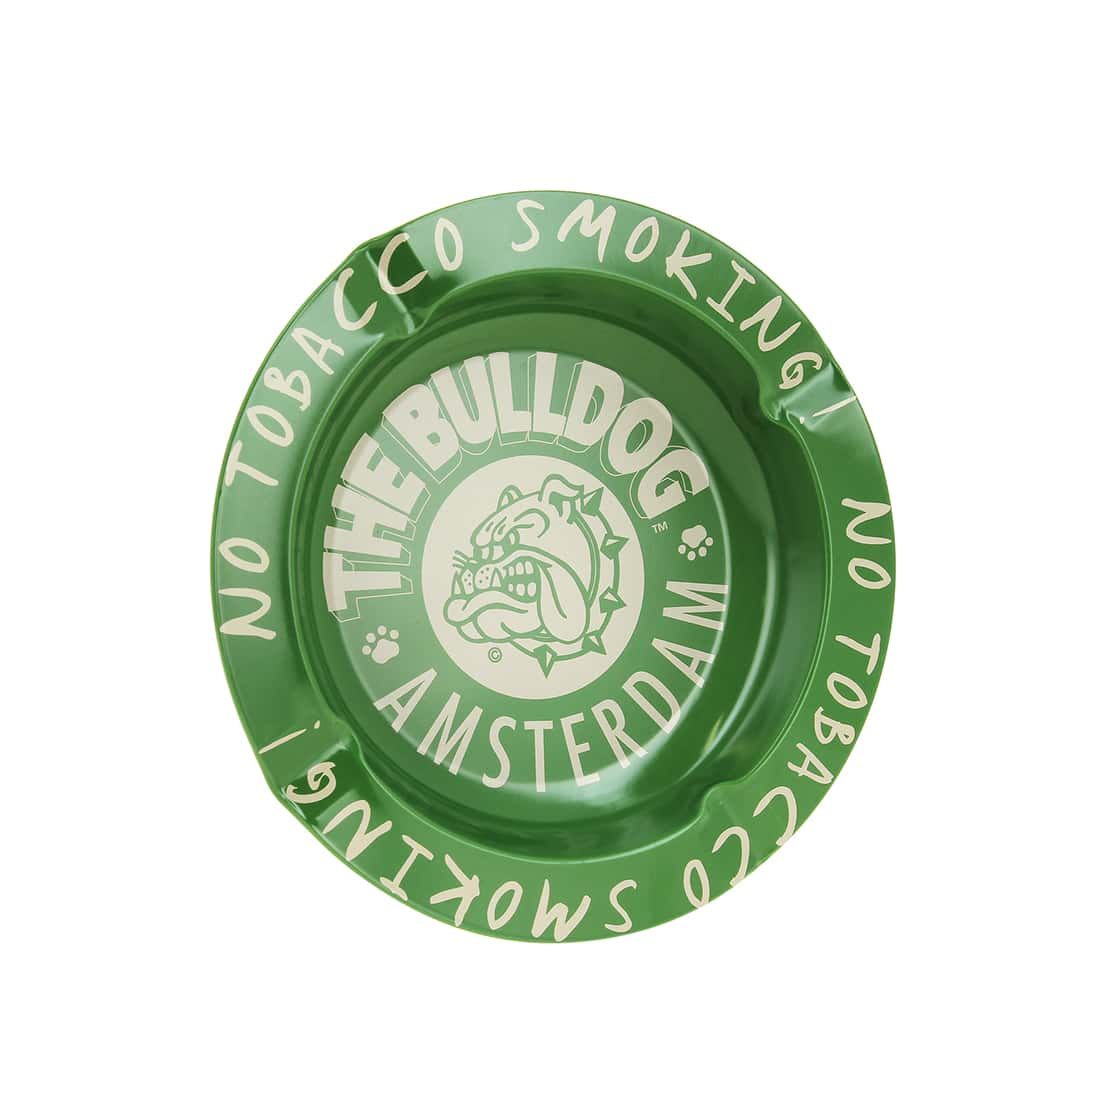 Photo de Cendrier The Bulldog Amsterdam métal vert